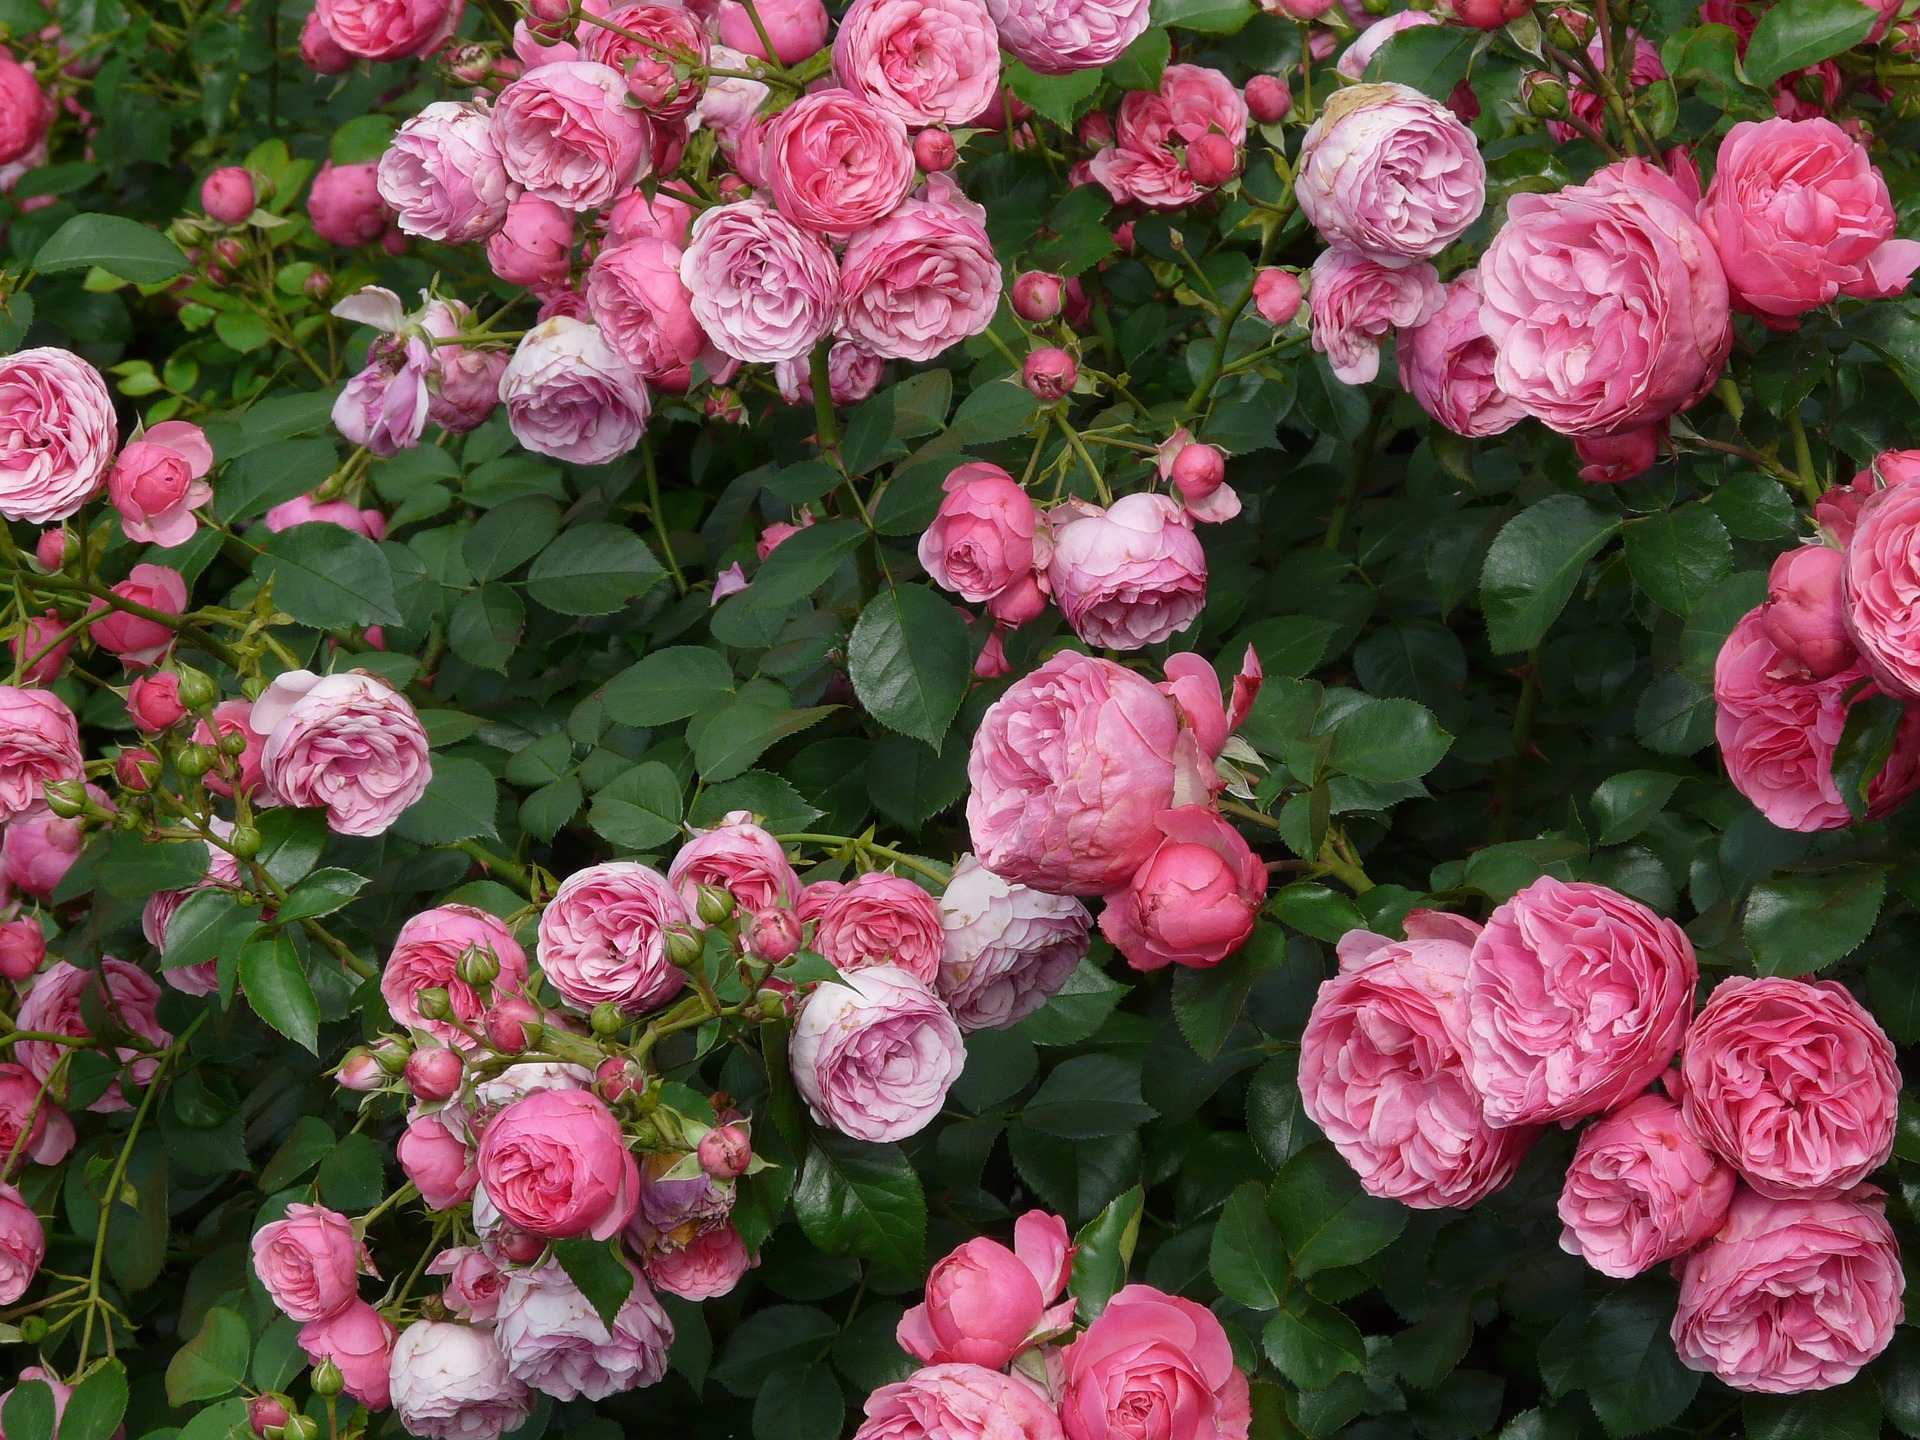 rose-8219_1920.jpg